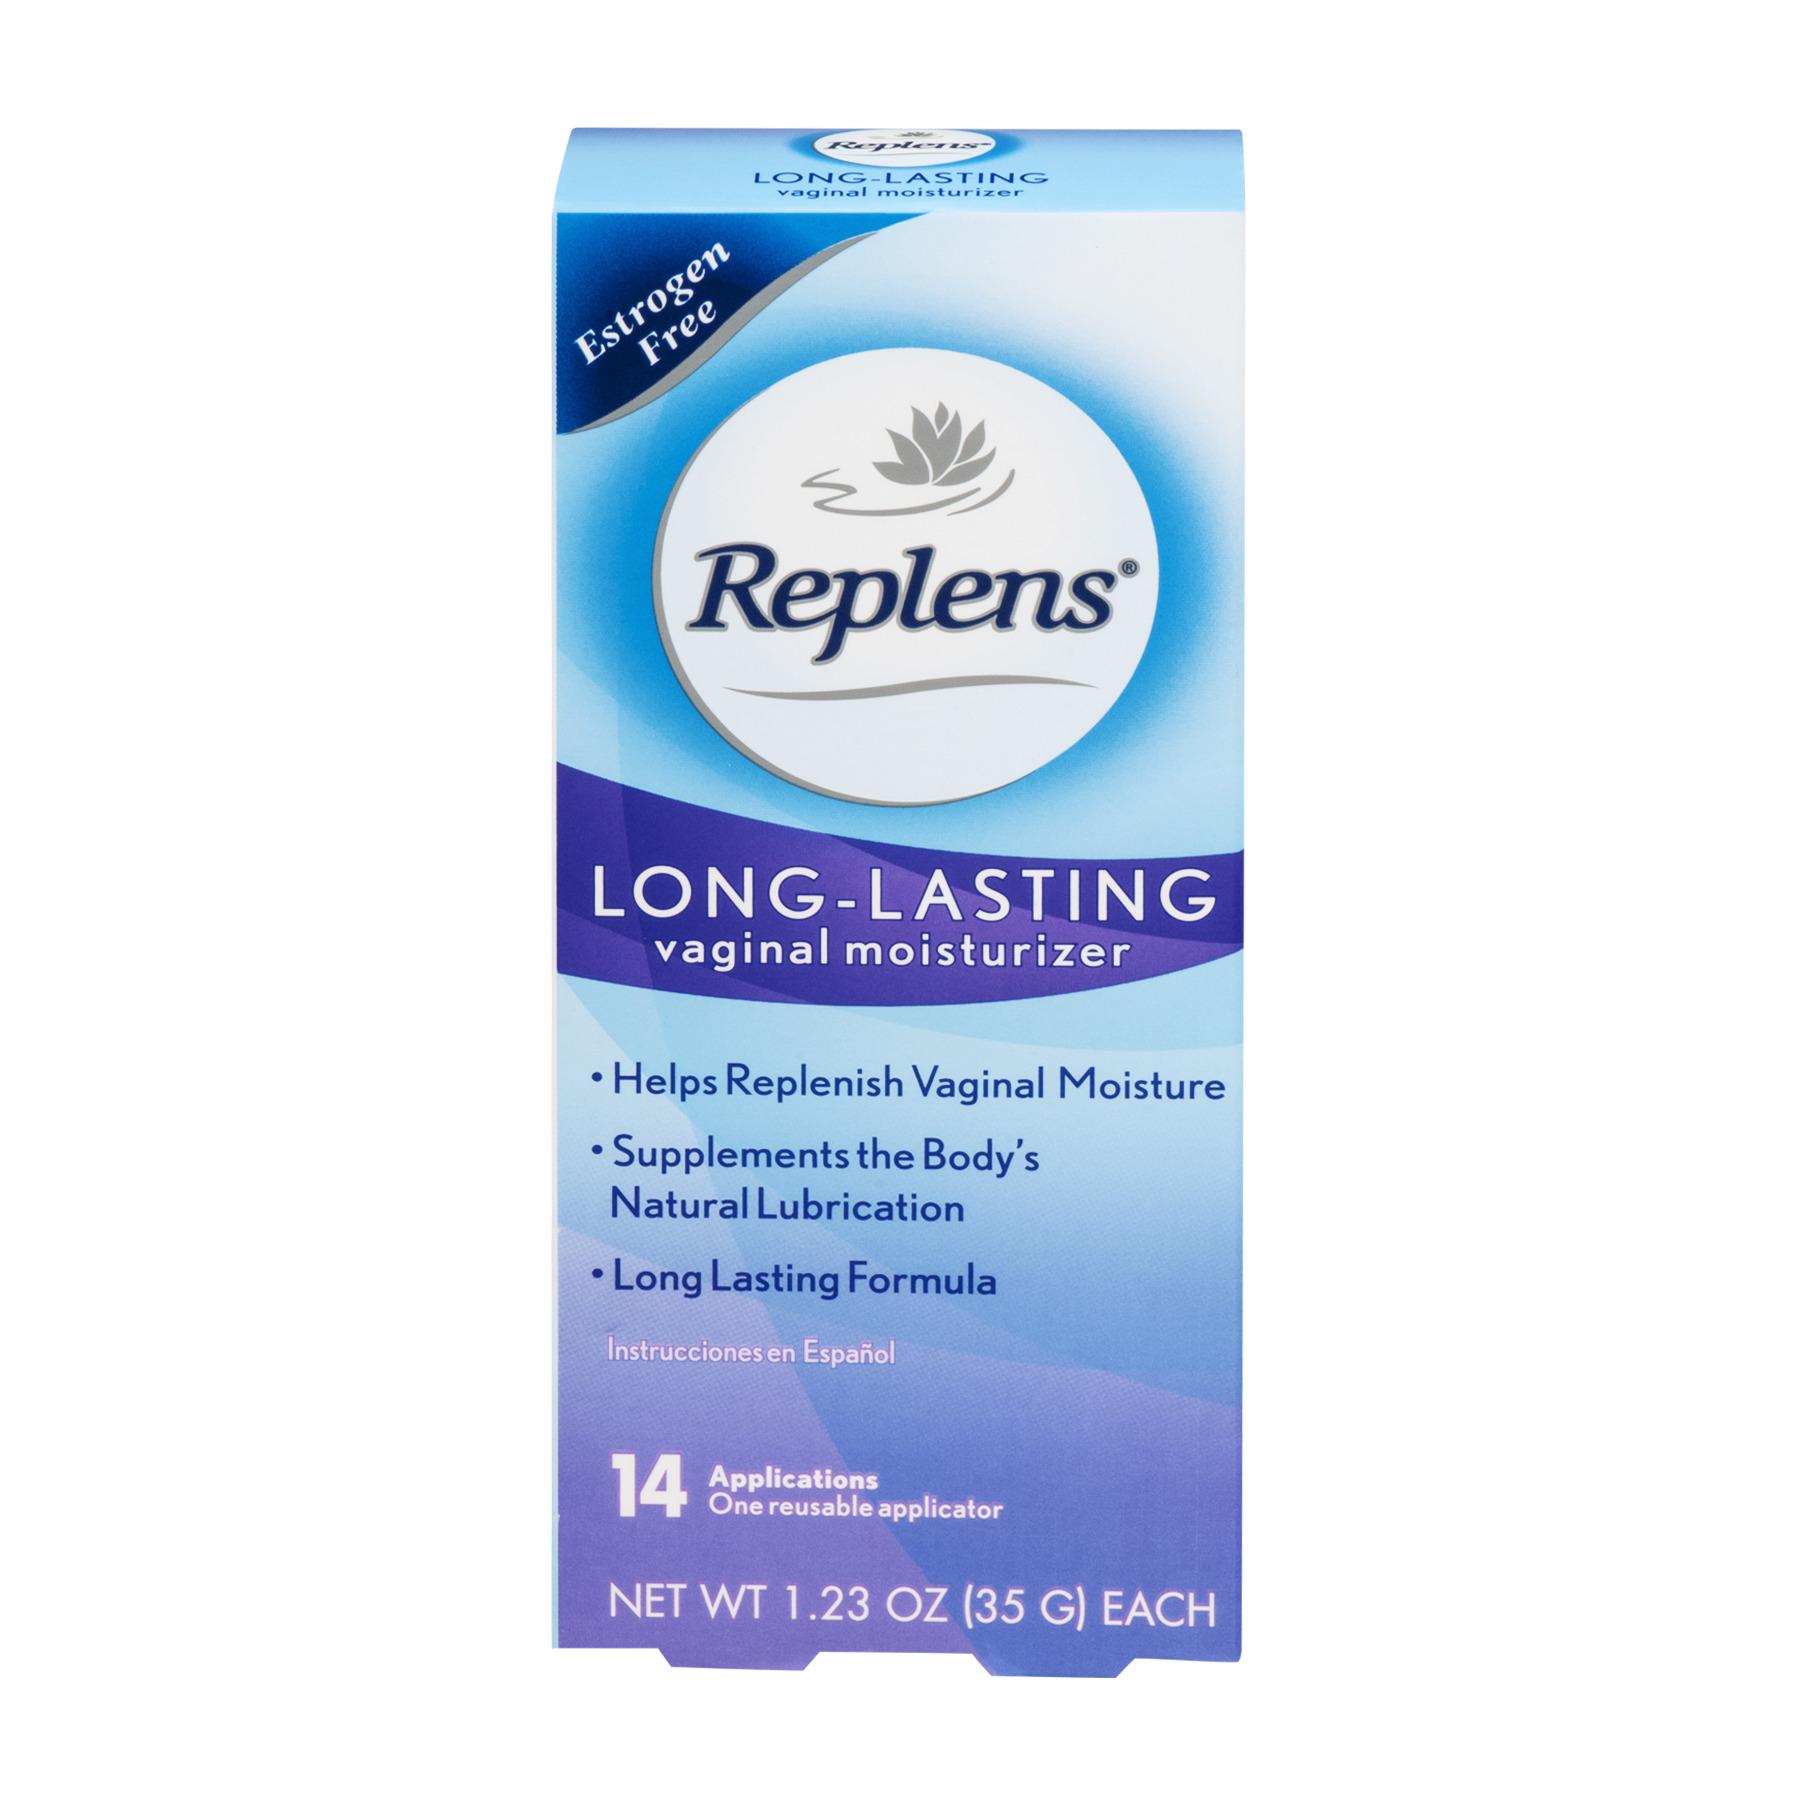 Replens Long Lasting Vaginal Moisturizer, 14ct